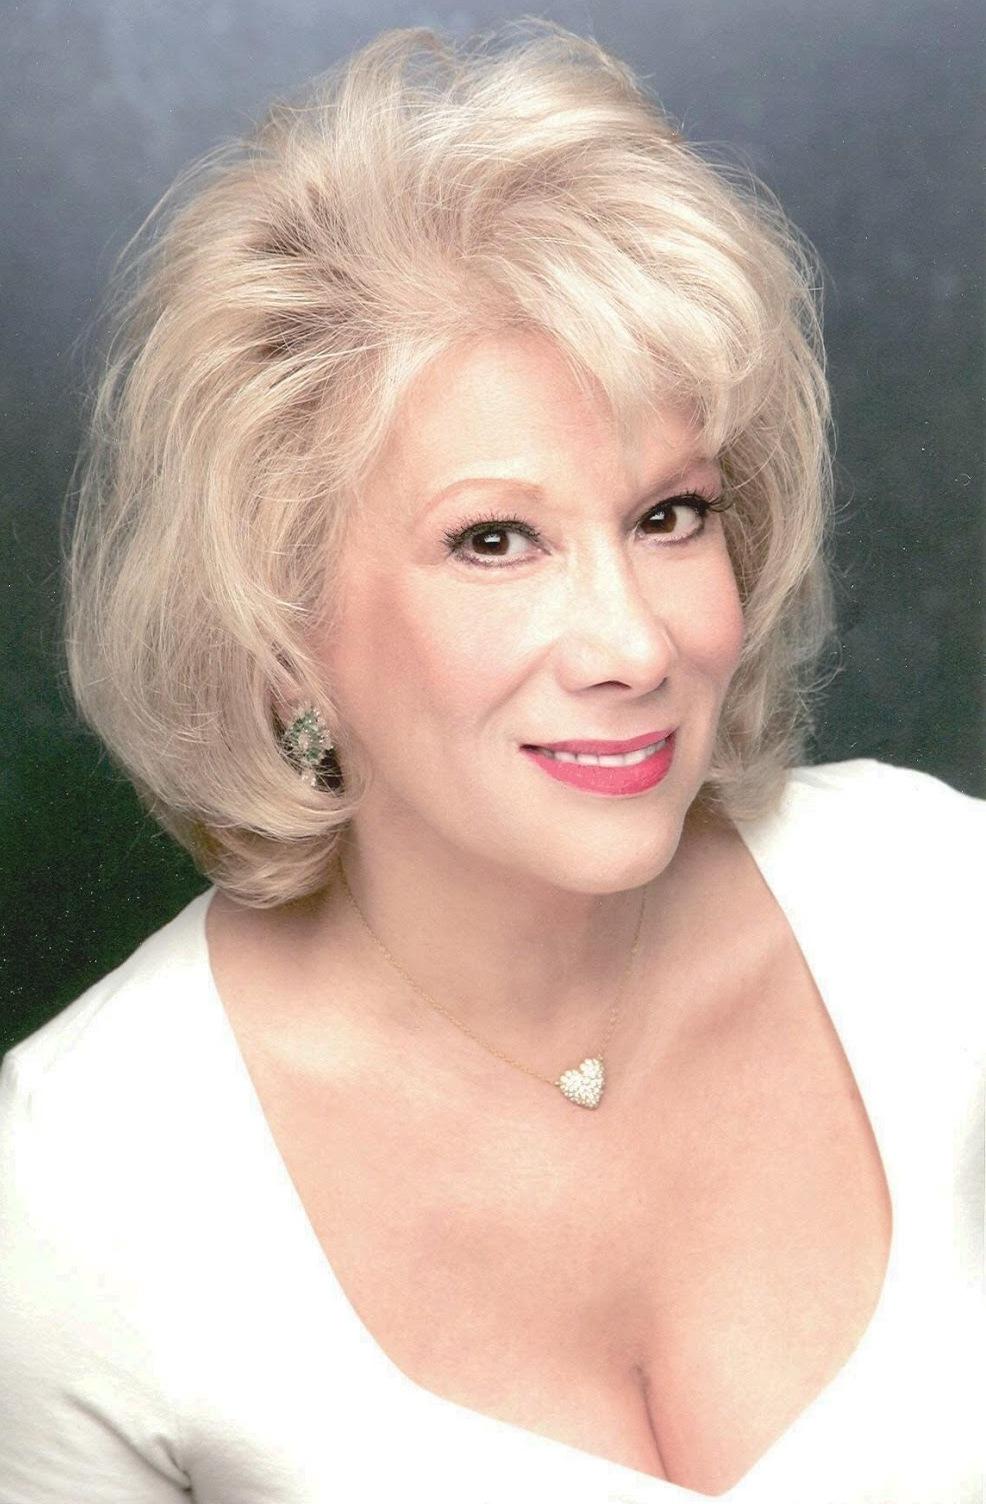 Marilyn_Michaels_-_White_top